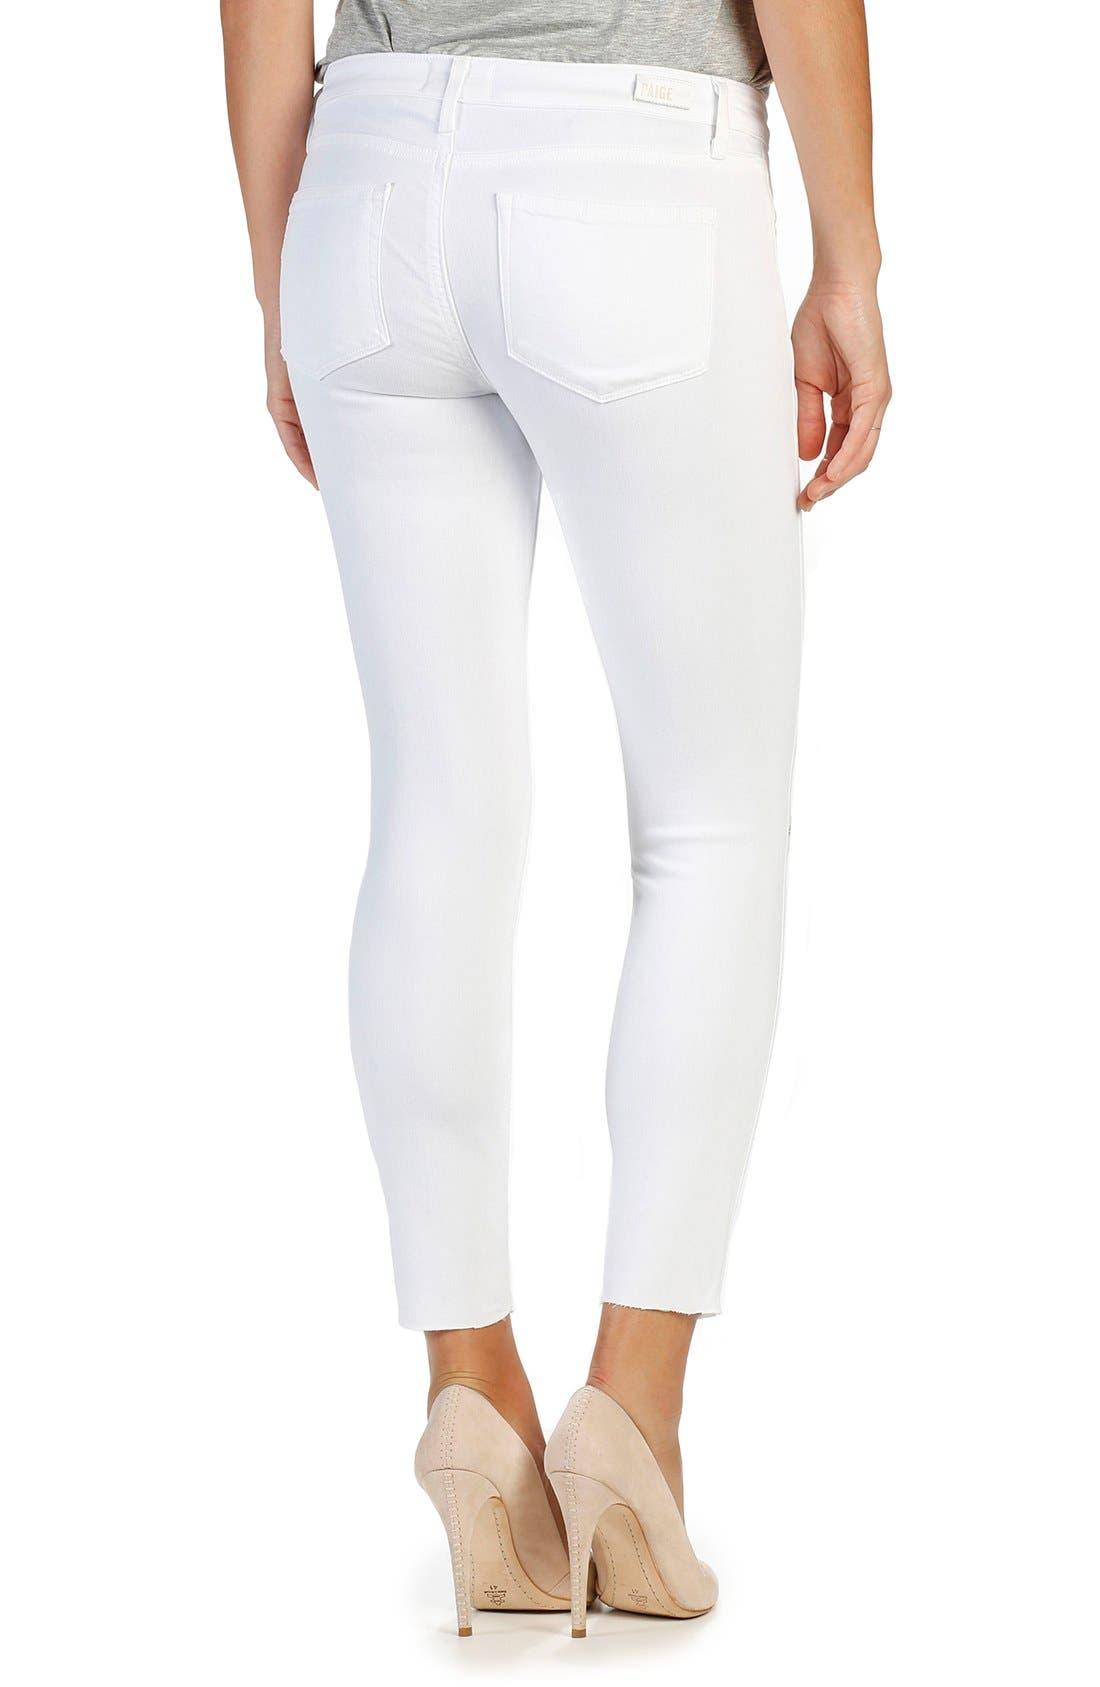 Transcend - Verdugo Ankle Skinny Jeans,                             Alternate thumbnail 2, color,                             White Cloud Destructed